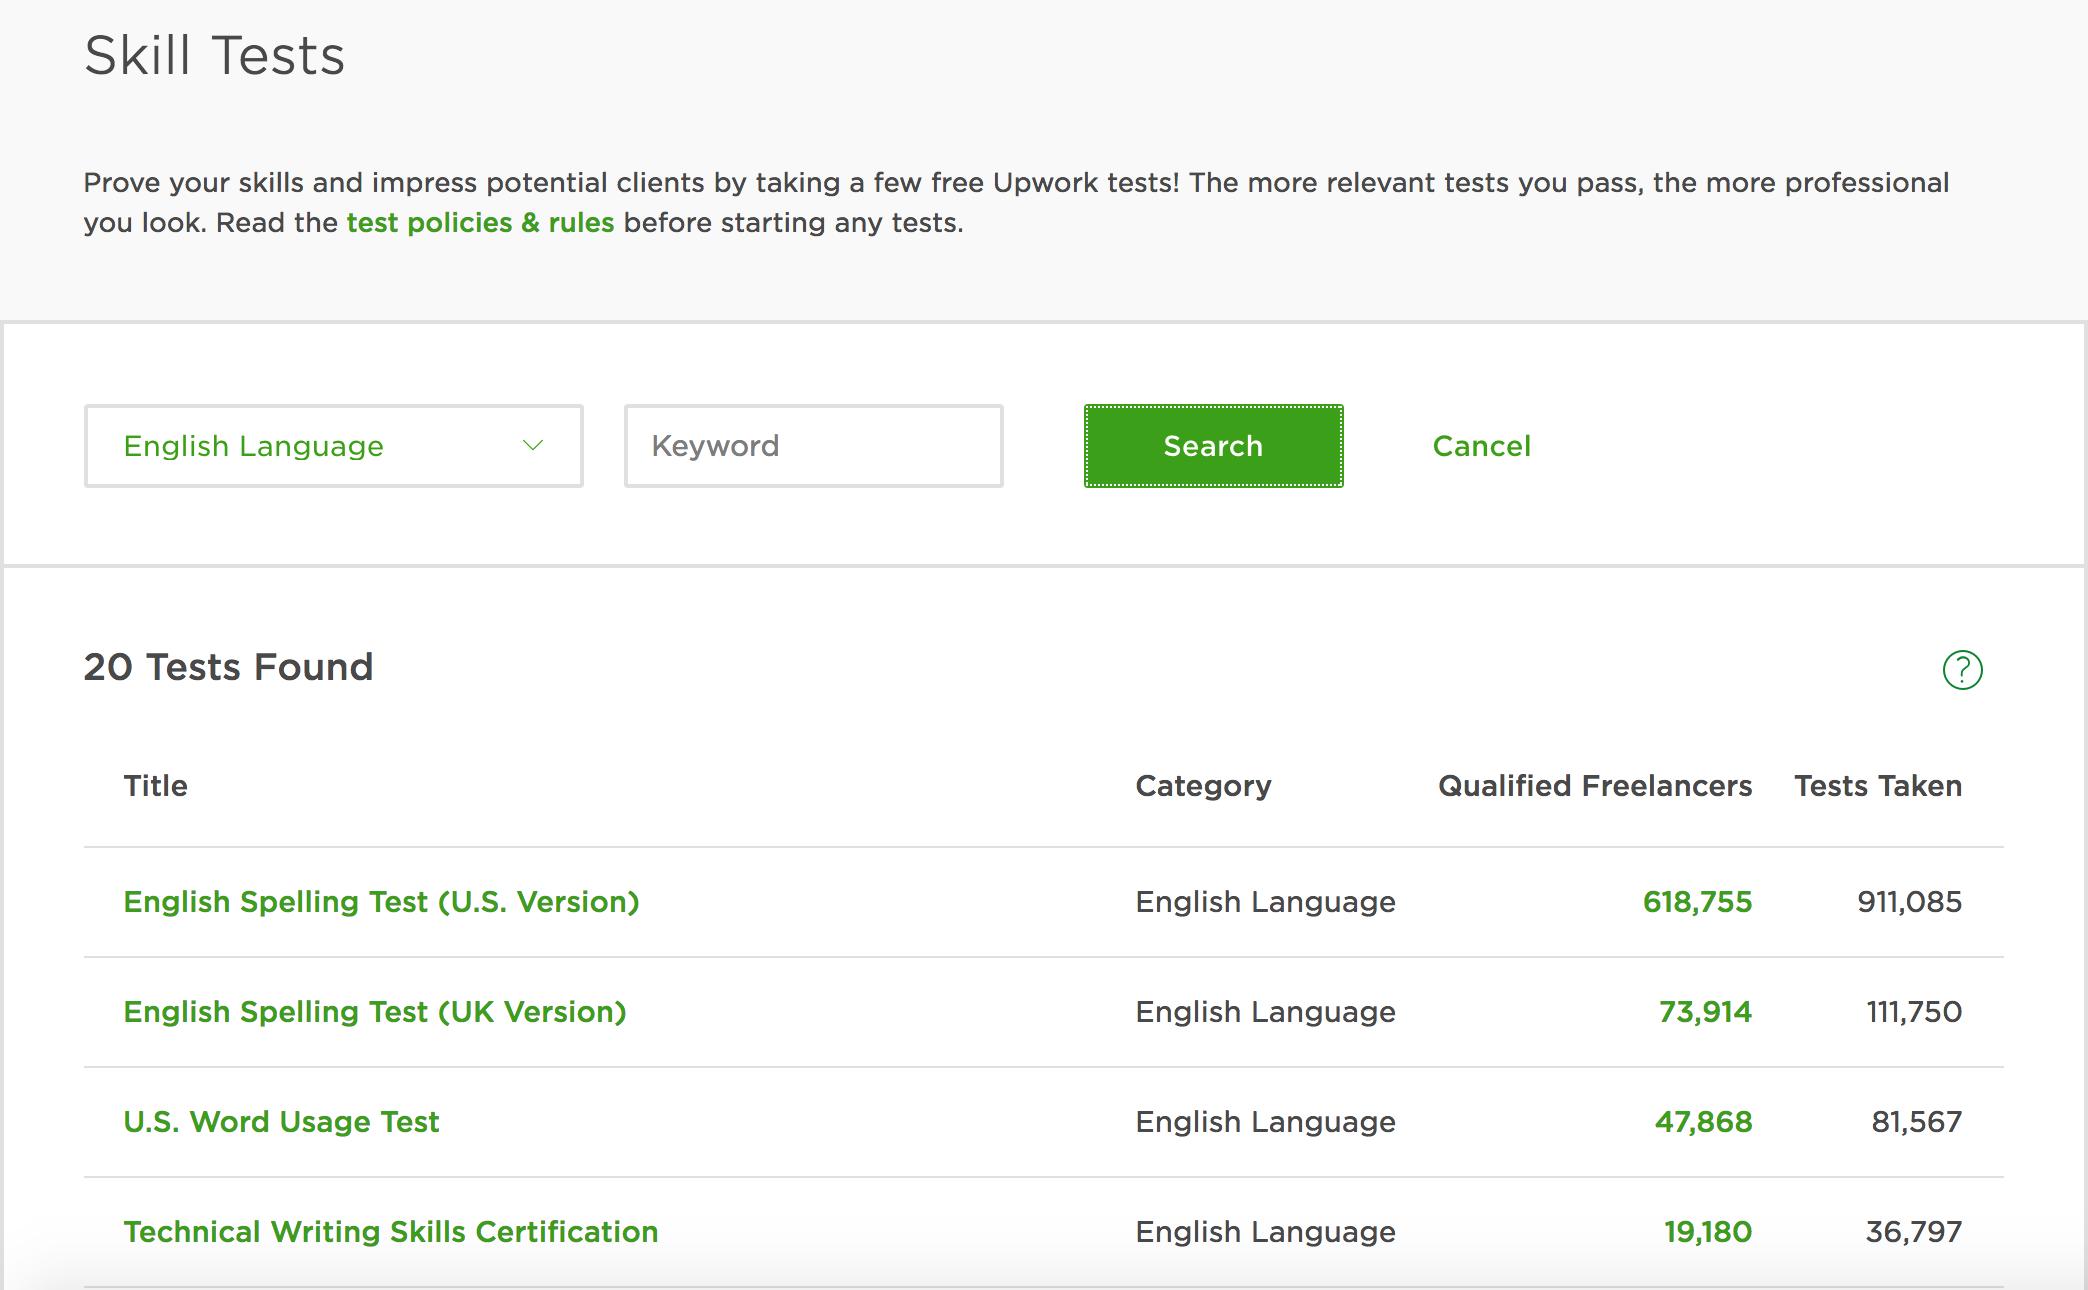 Solved: UK English Basic Skills test is not in the li... - Upwork ...